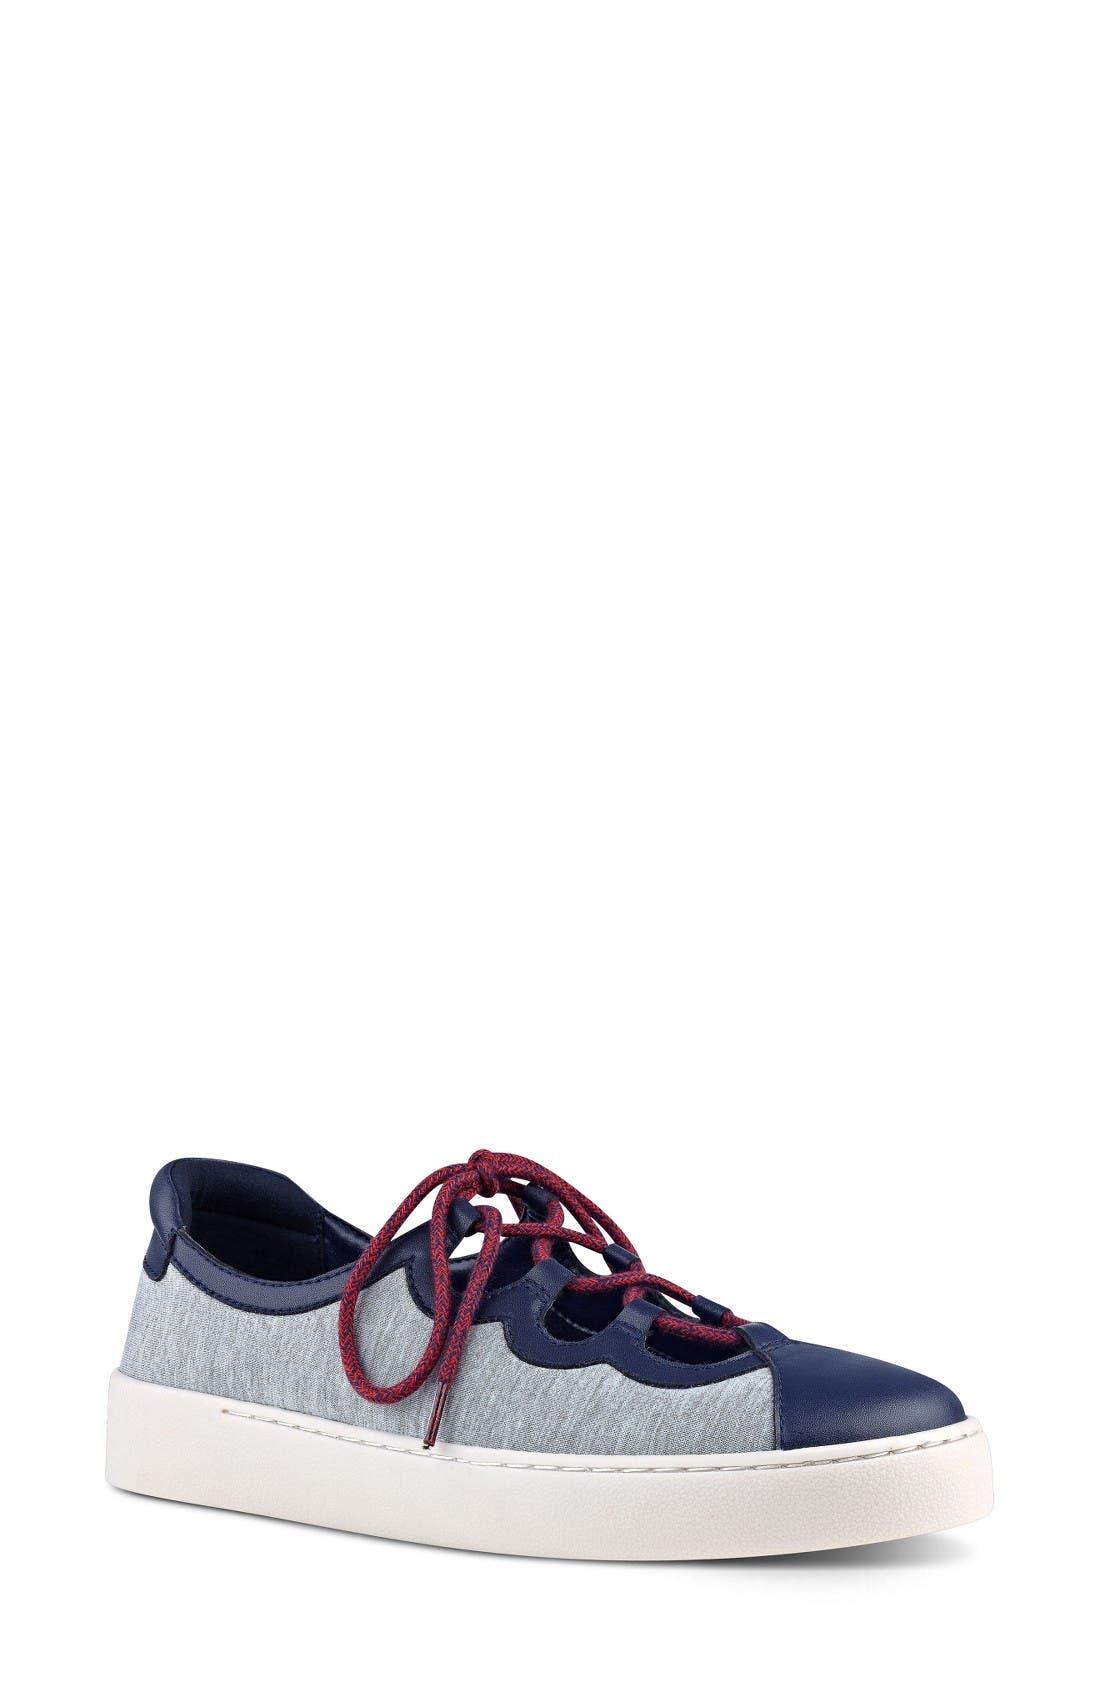 NINE WEST Pylot Lace-Up Sneaker